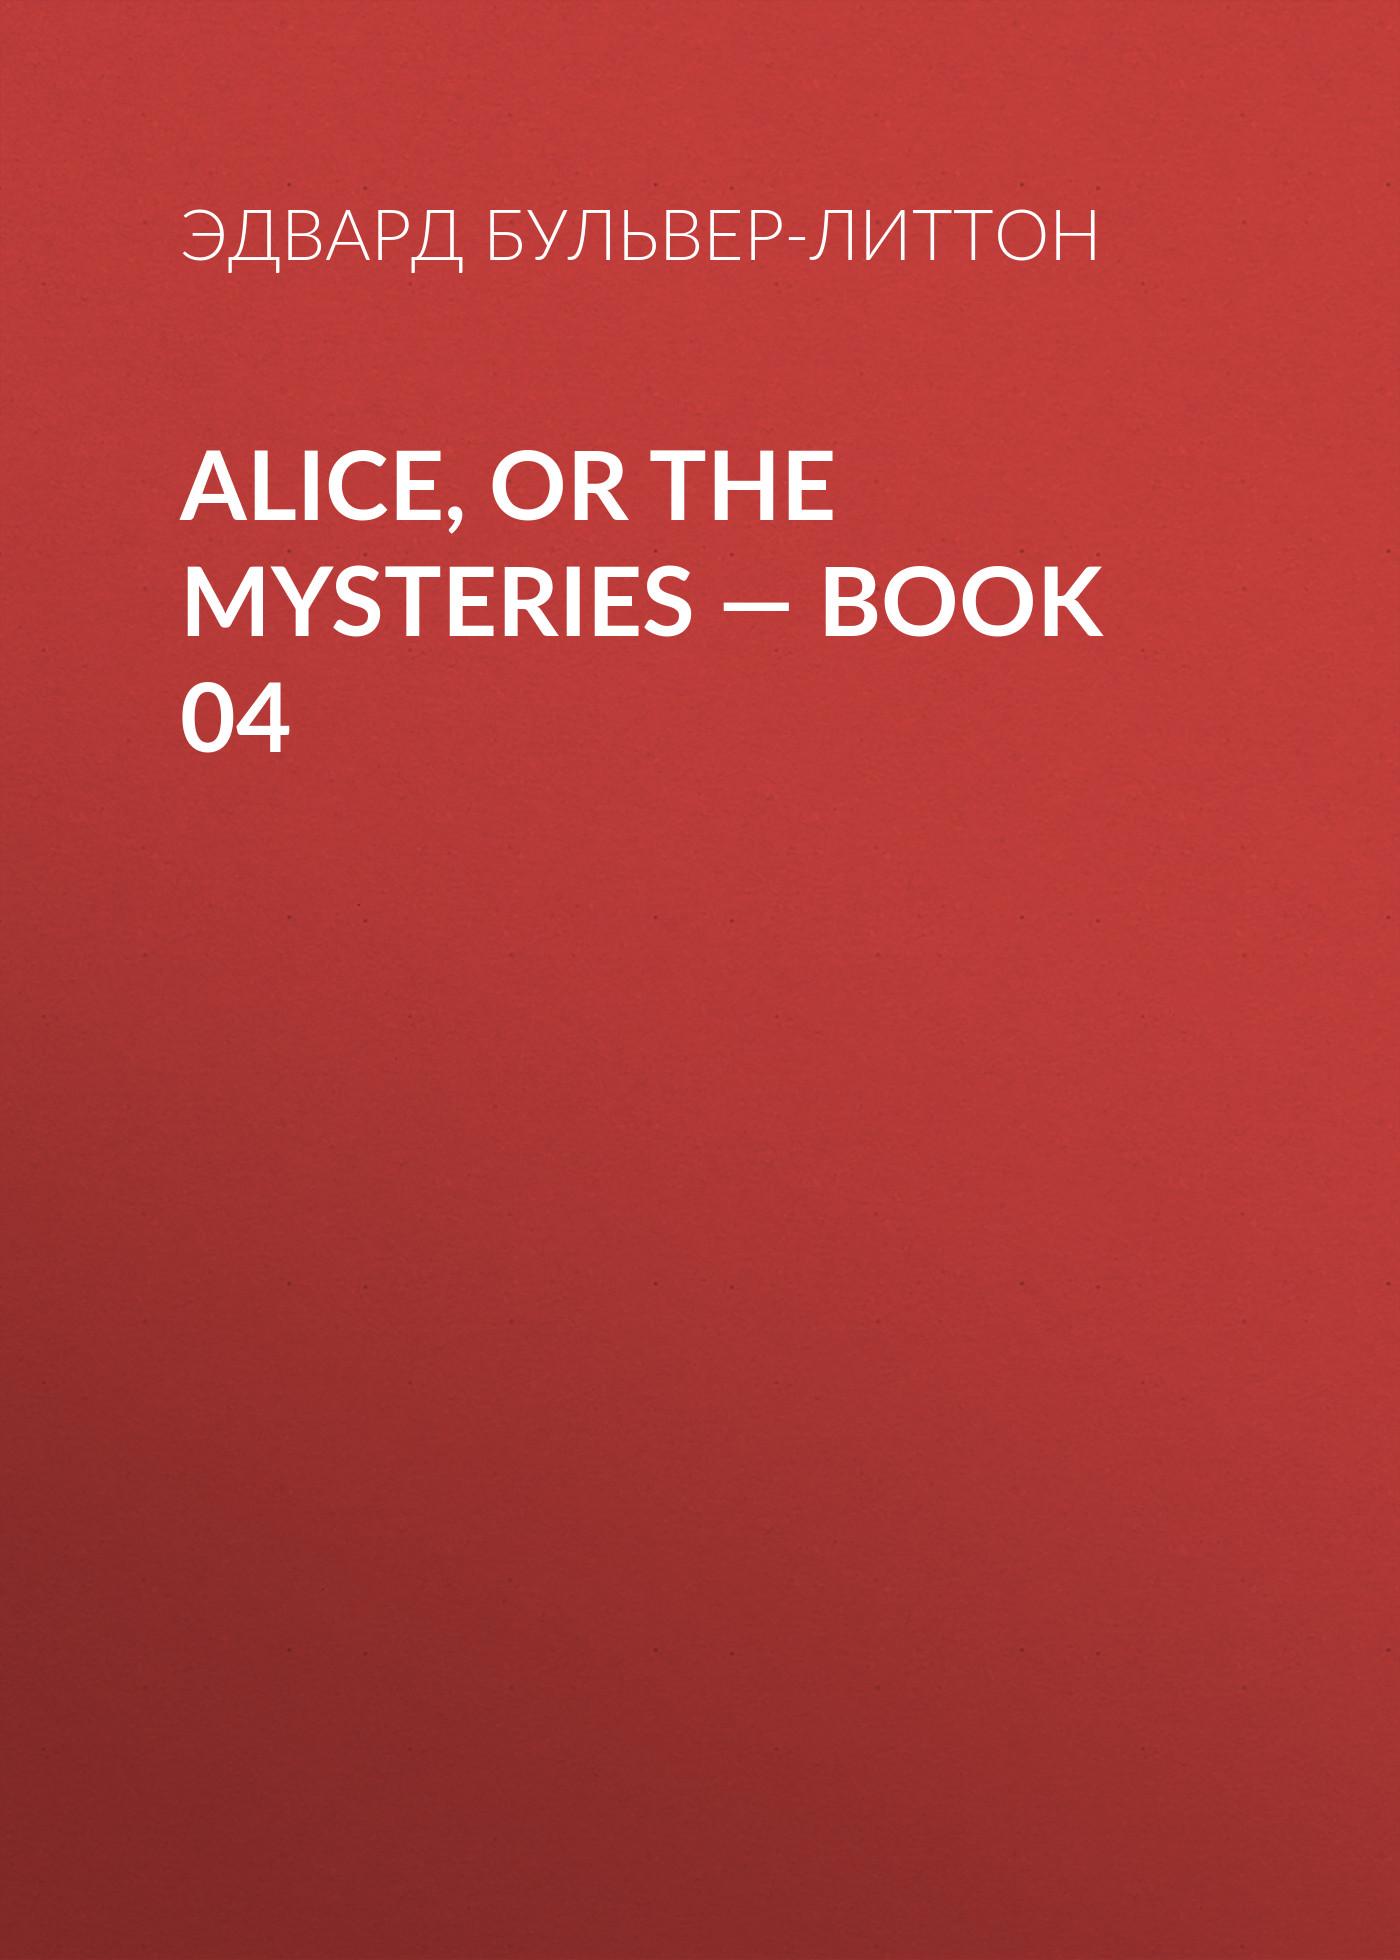 Эдвард Бульвер-Литтон Alice, or the Mysteries — Book 04